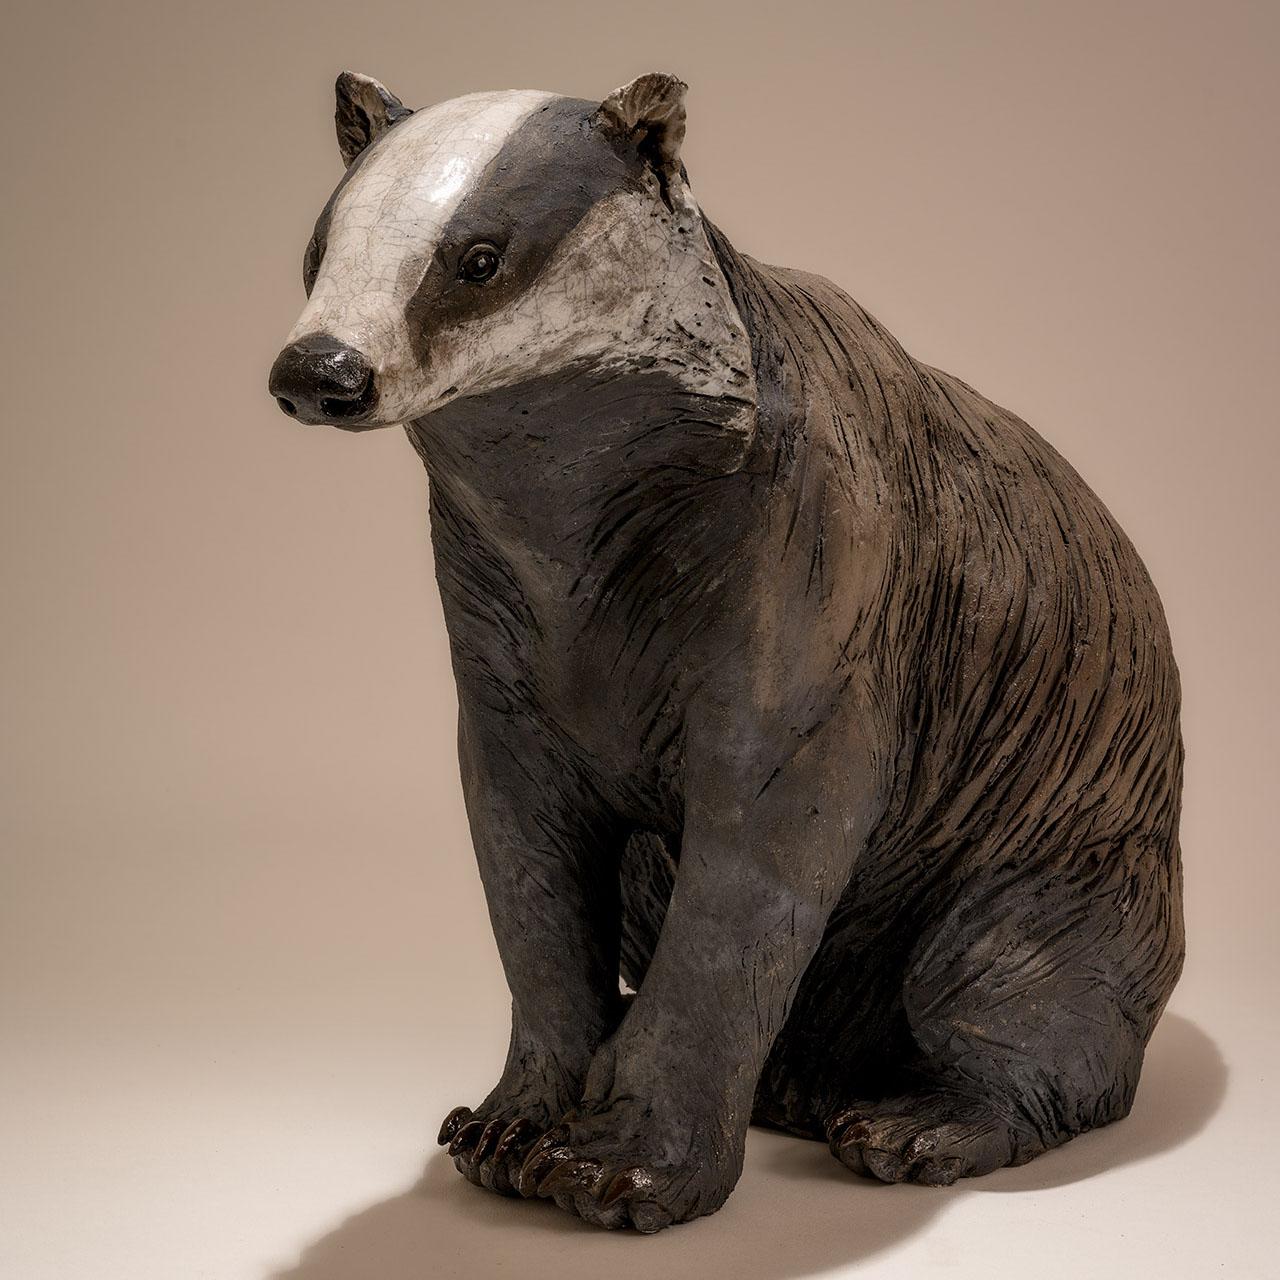 Badger Exhibition 2019